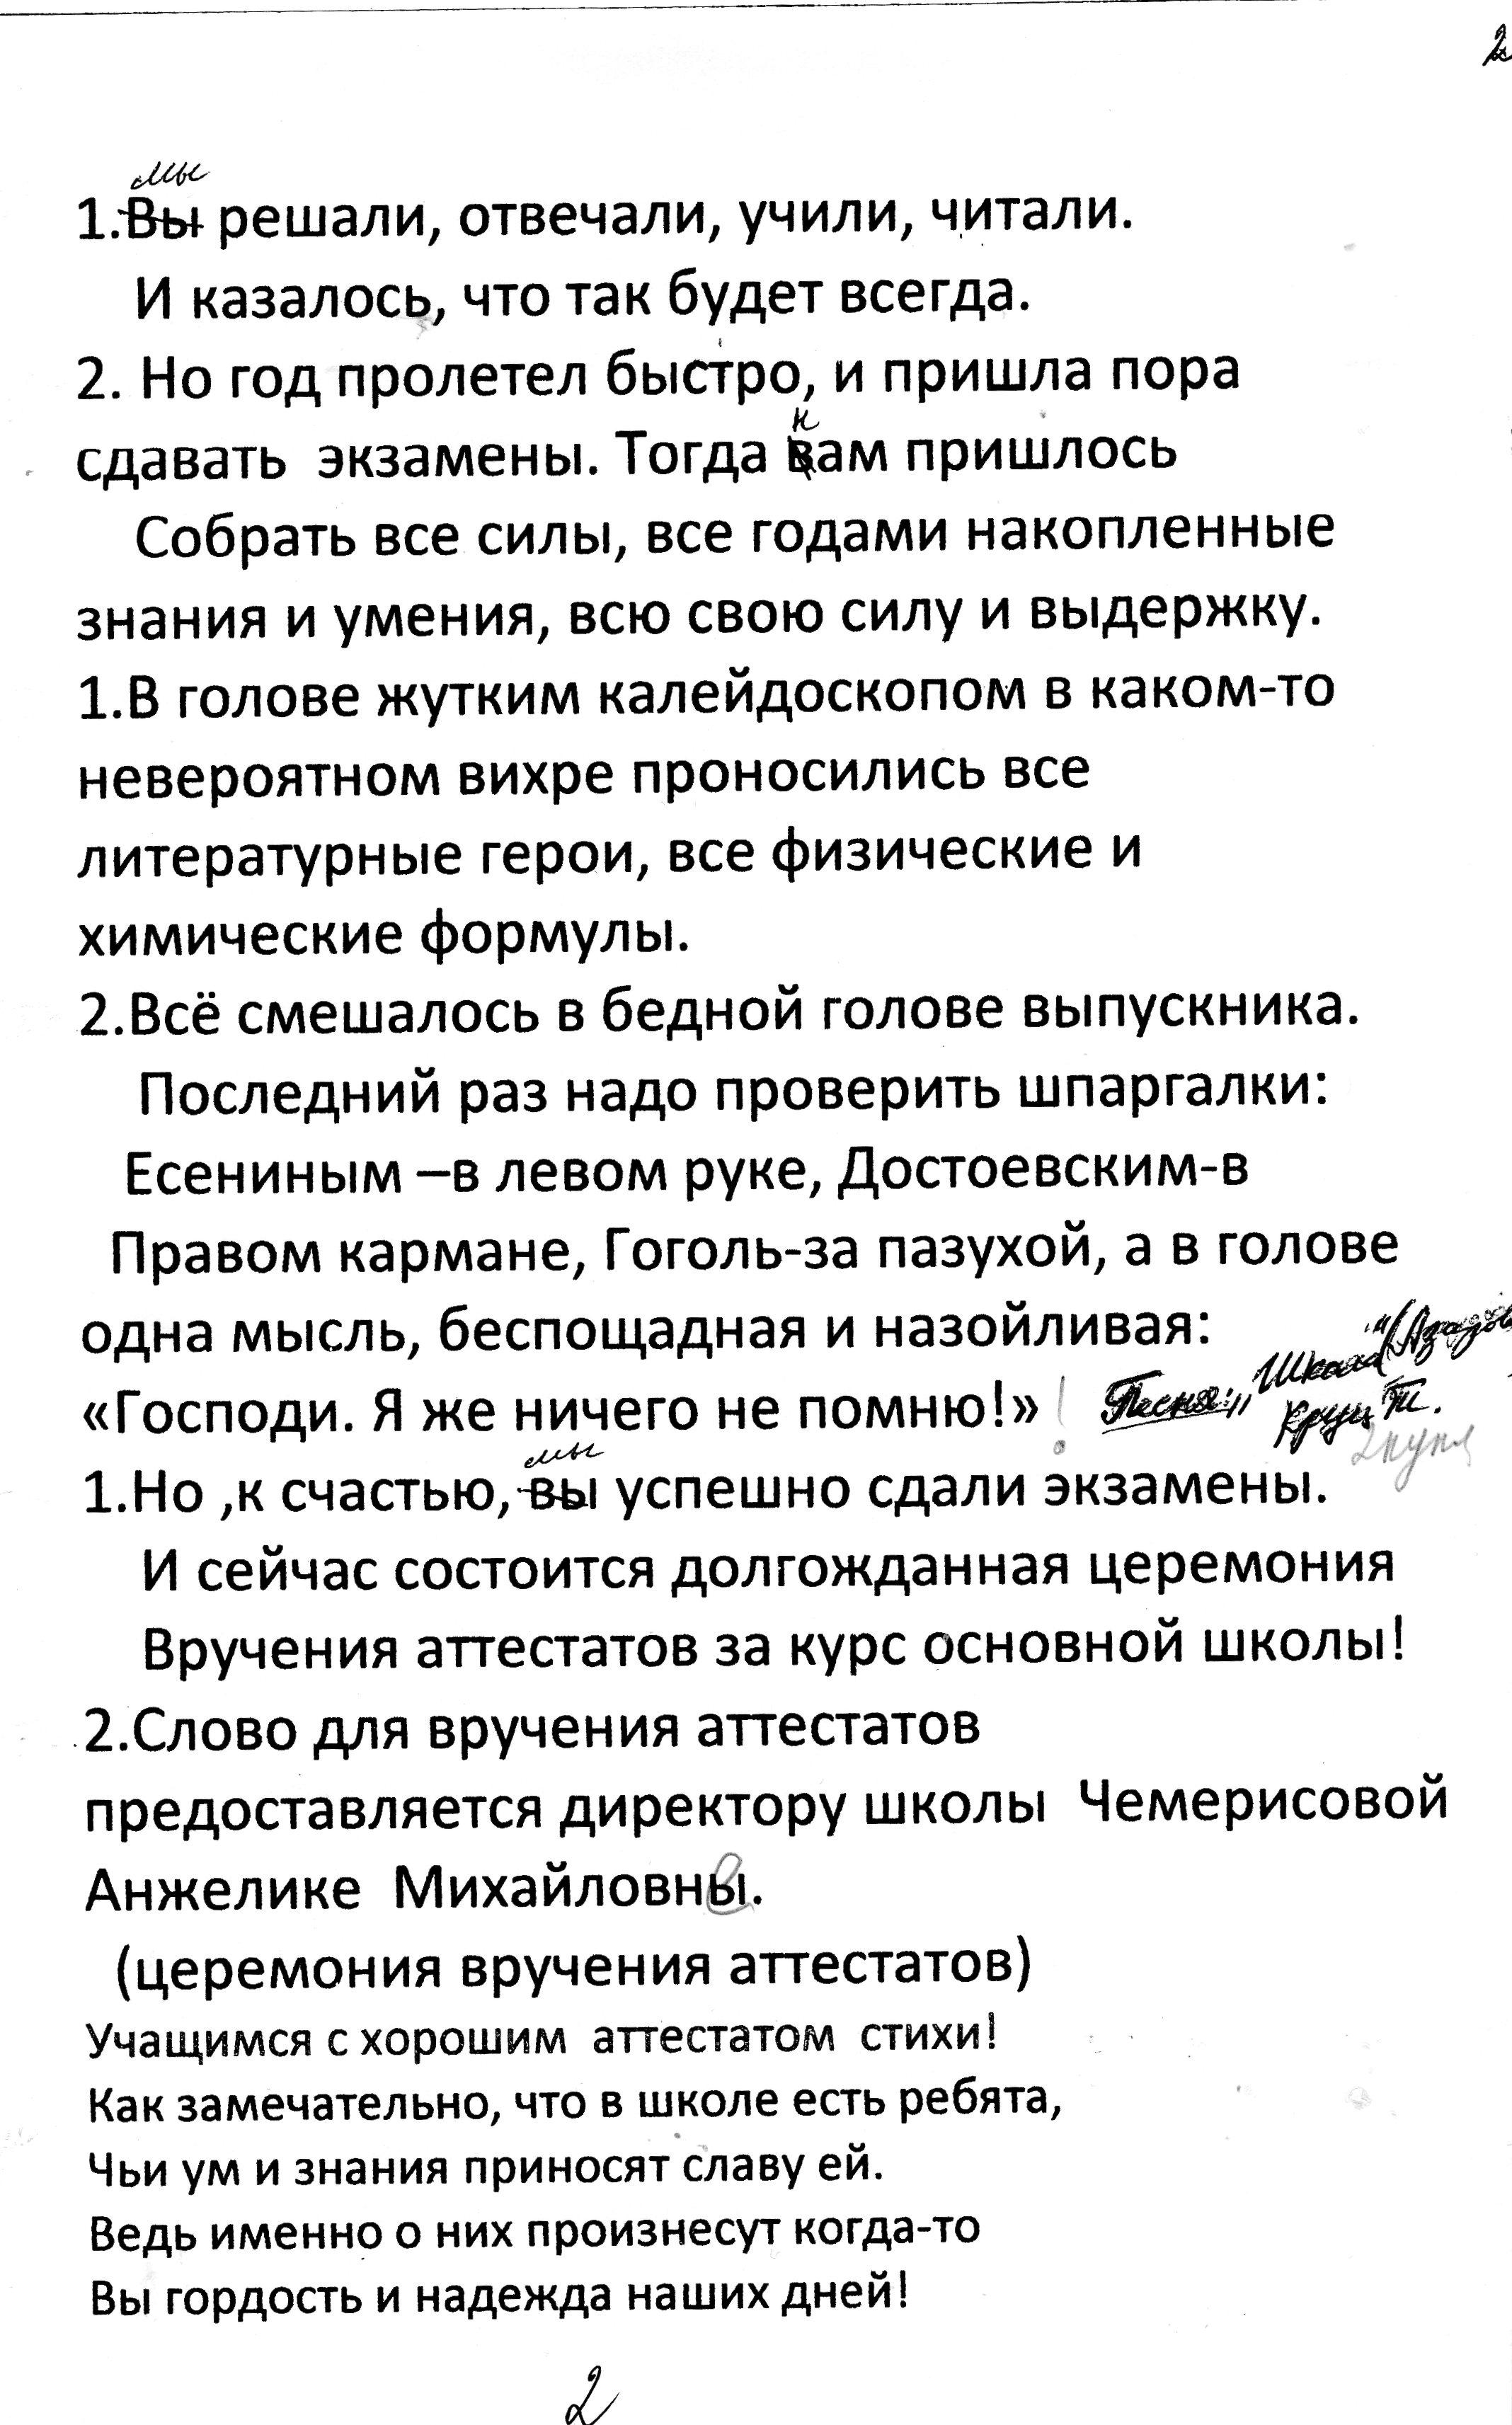 C:\Documents and Settings\ADMIN\Мои документы\9 кл выпускной\img008.jpg